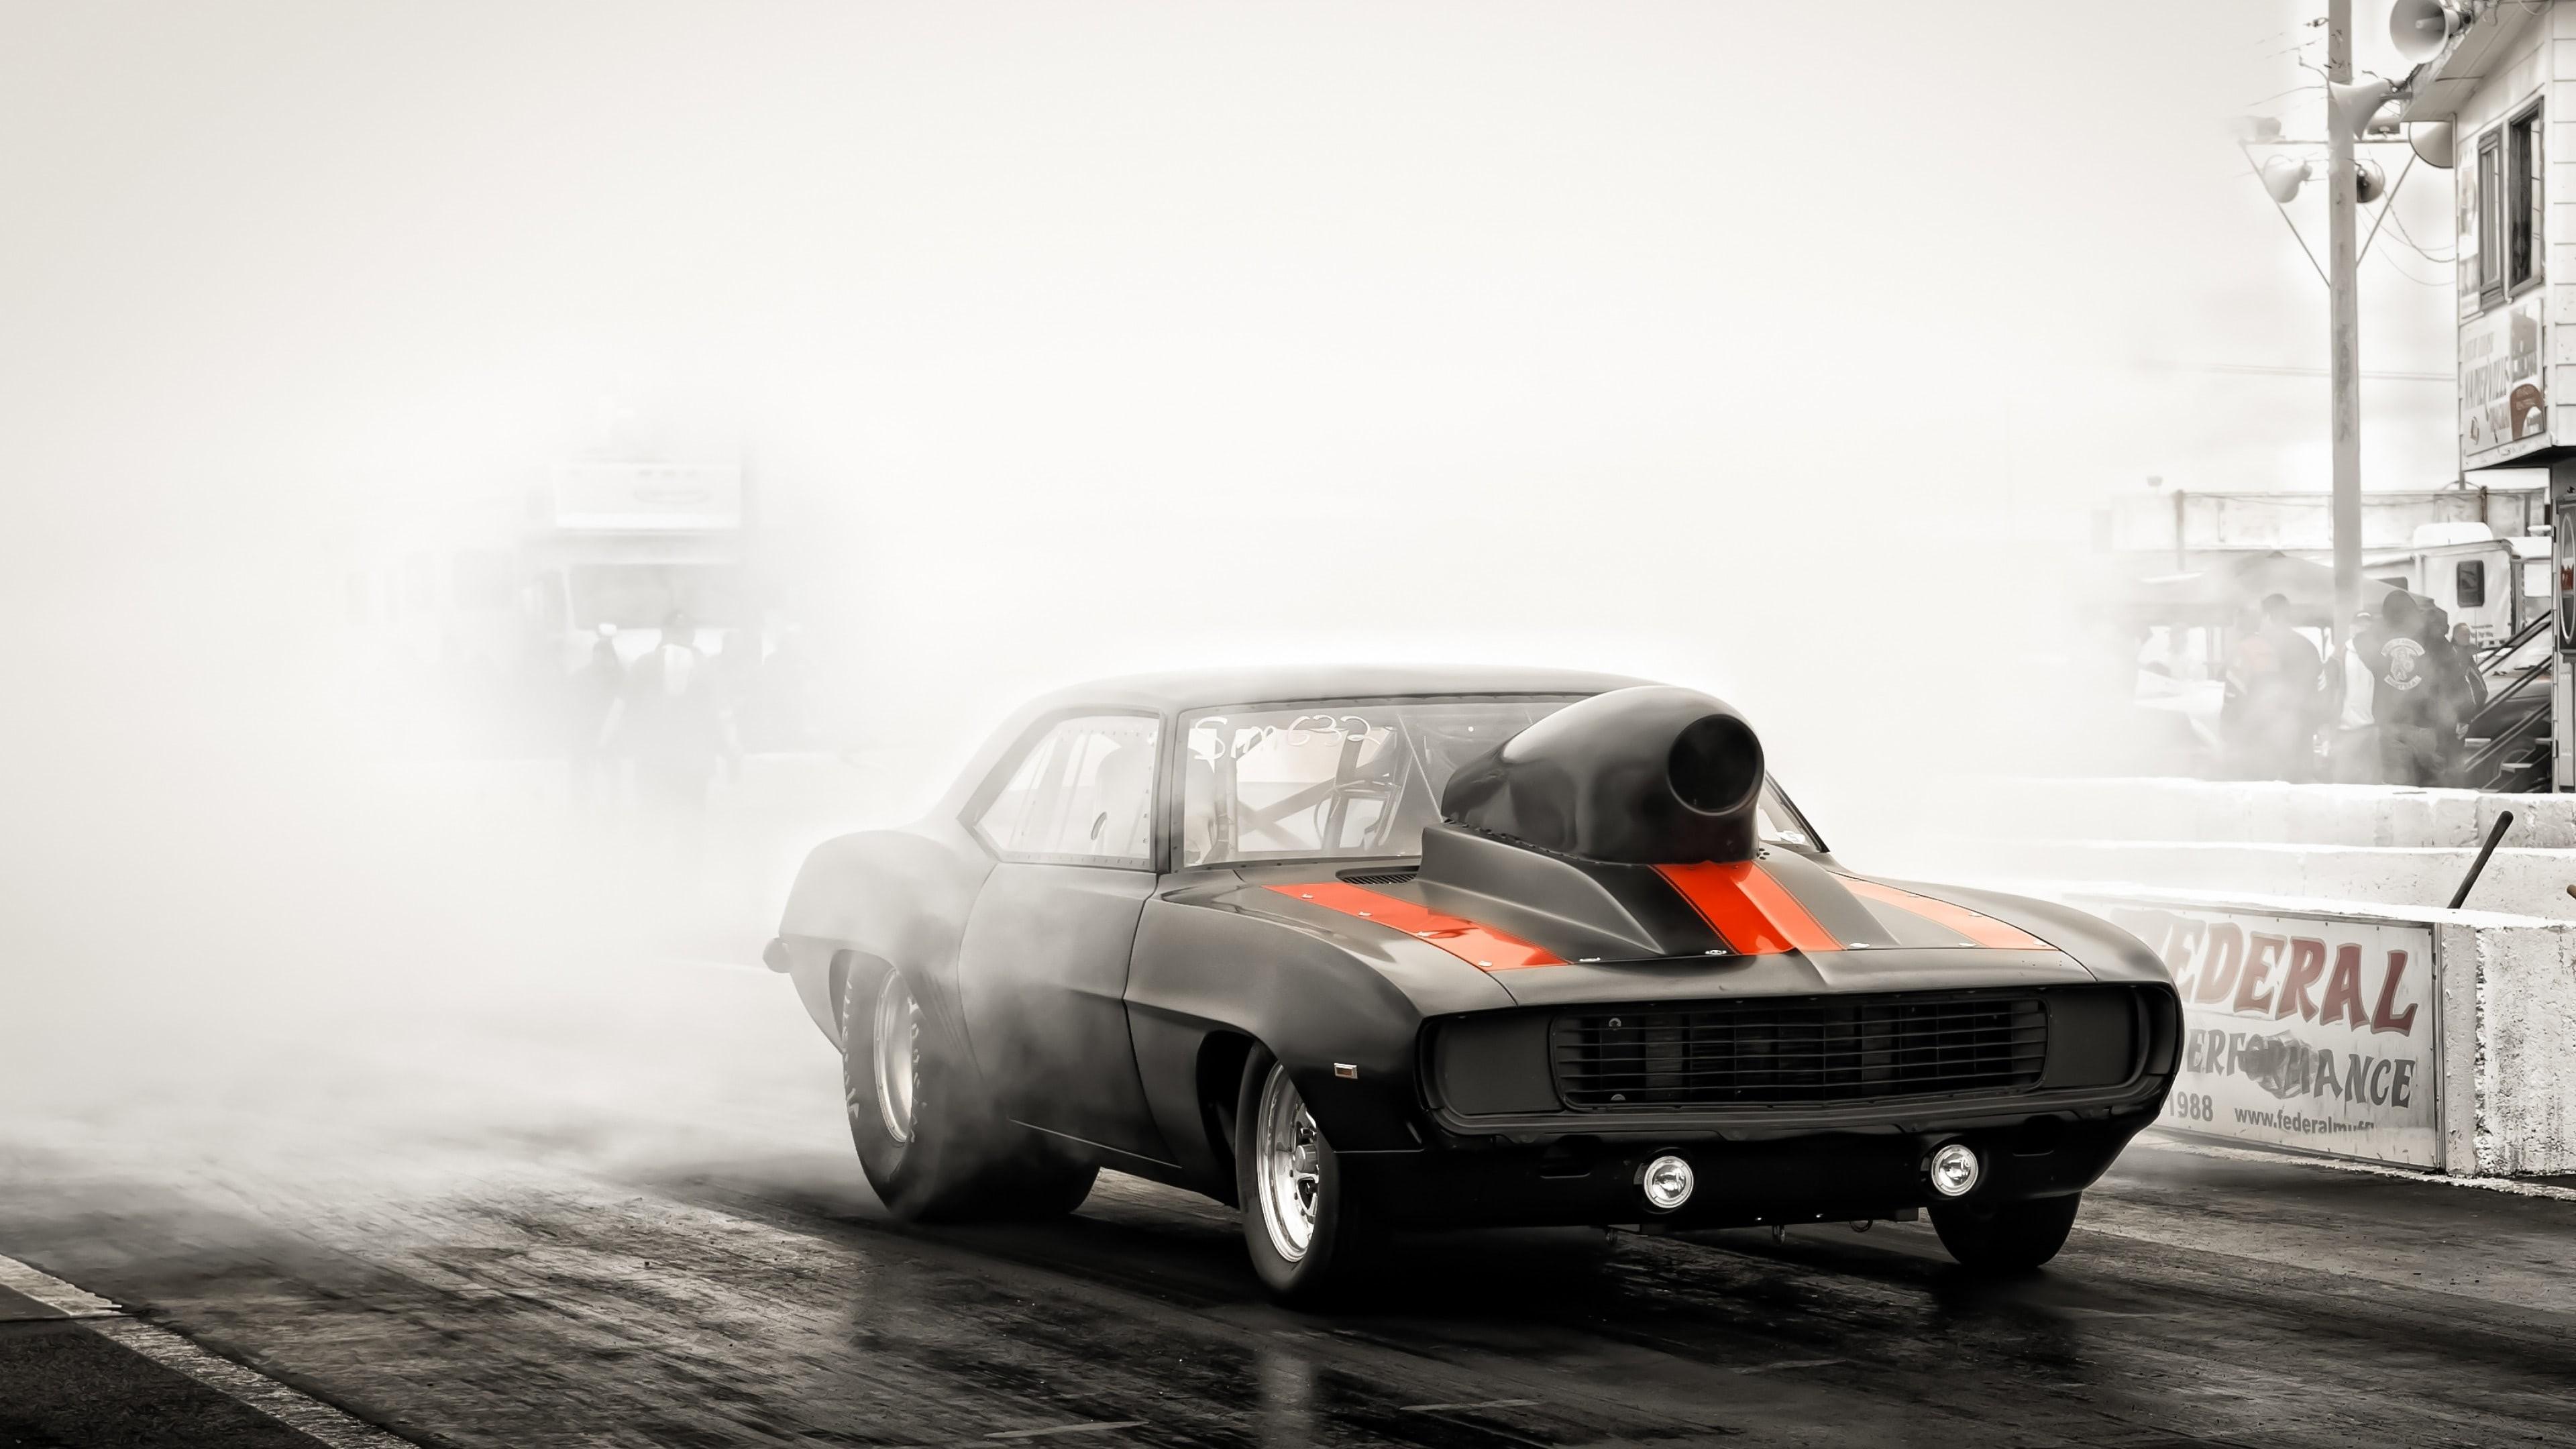 Drag Race Car Wallpaper (69+ images)